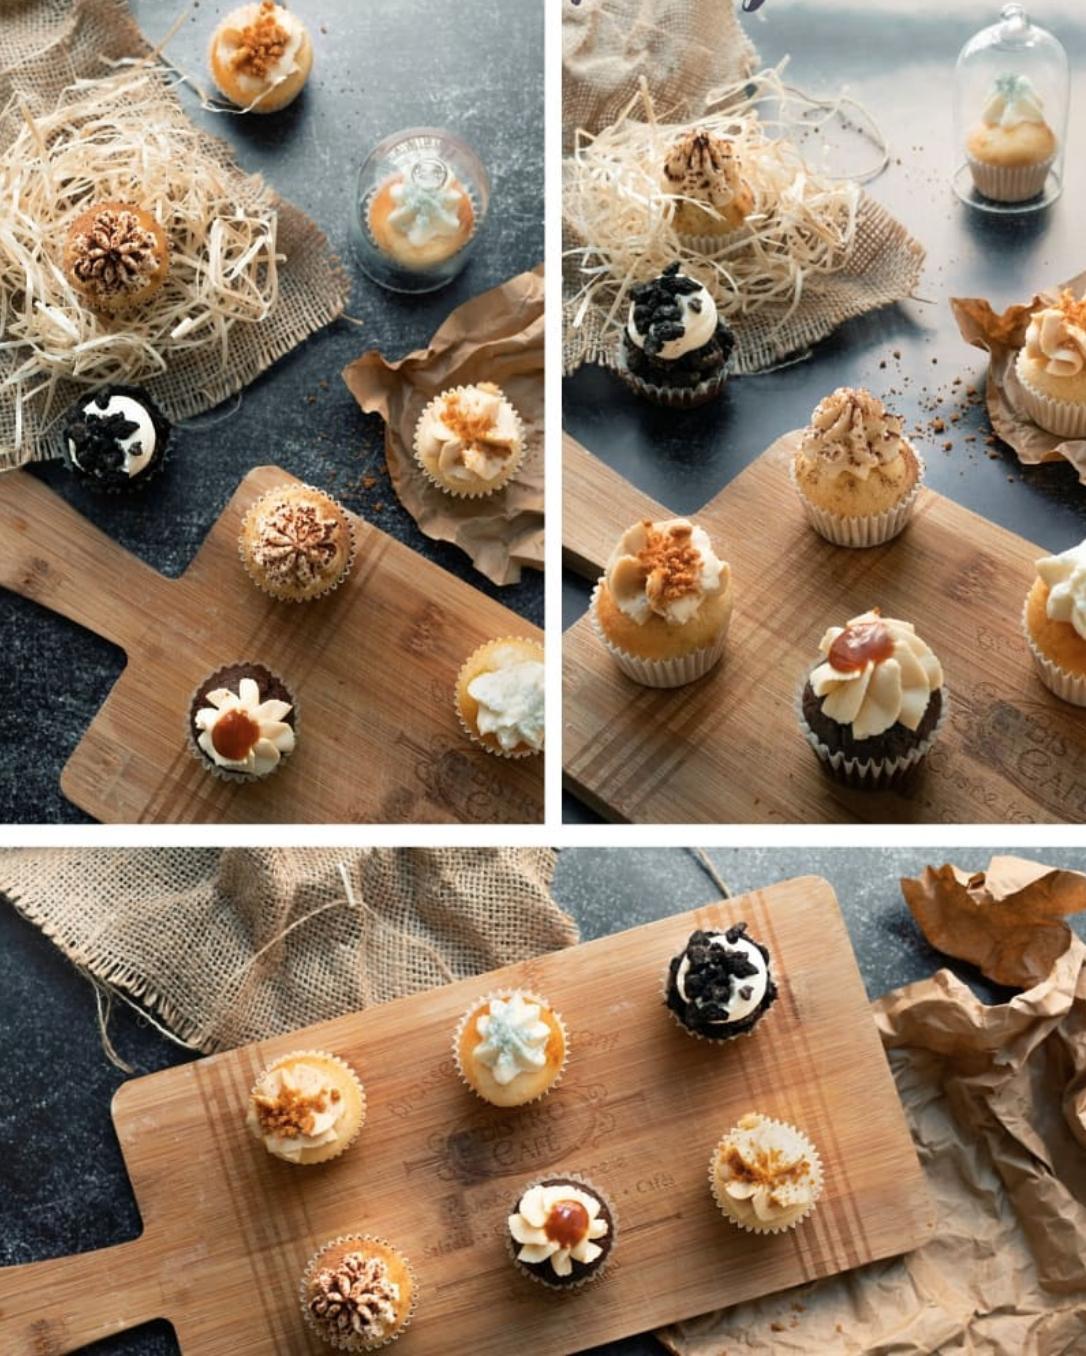 Baby cupcakes ©marine_Blue_Photographie